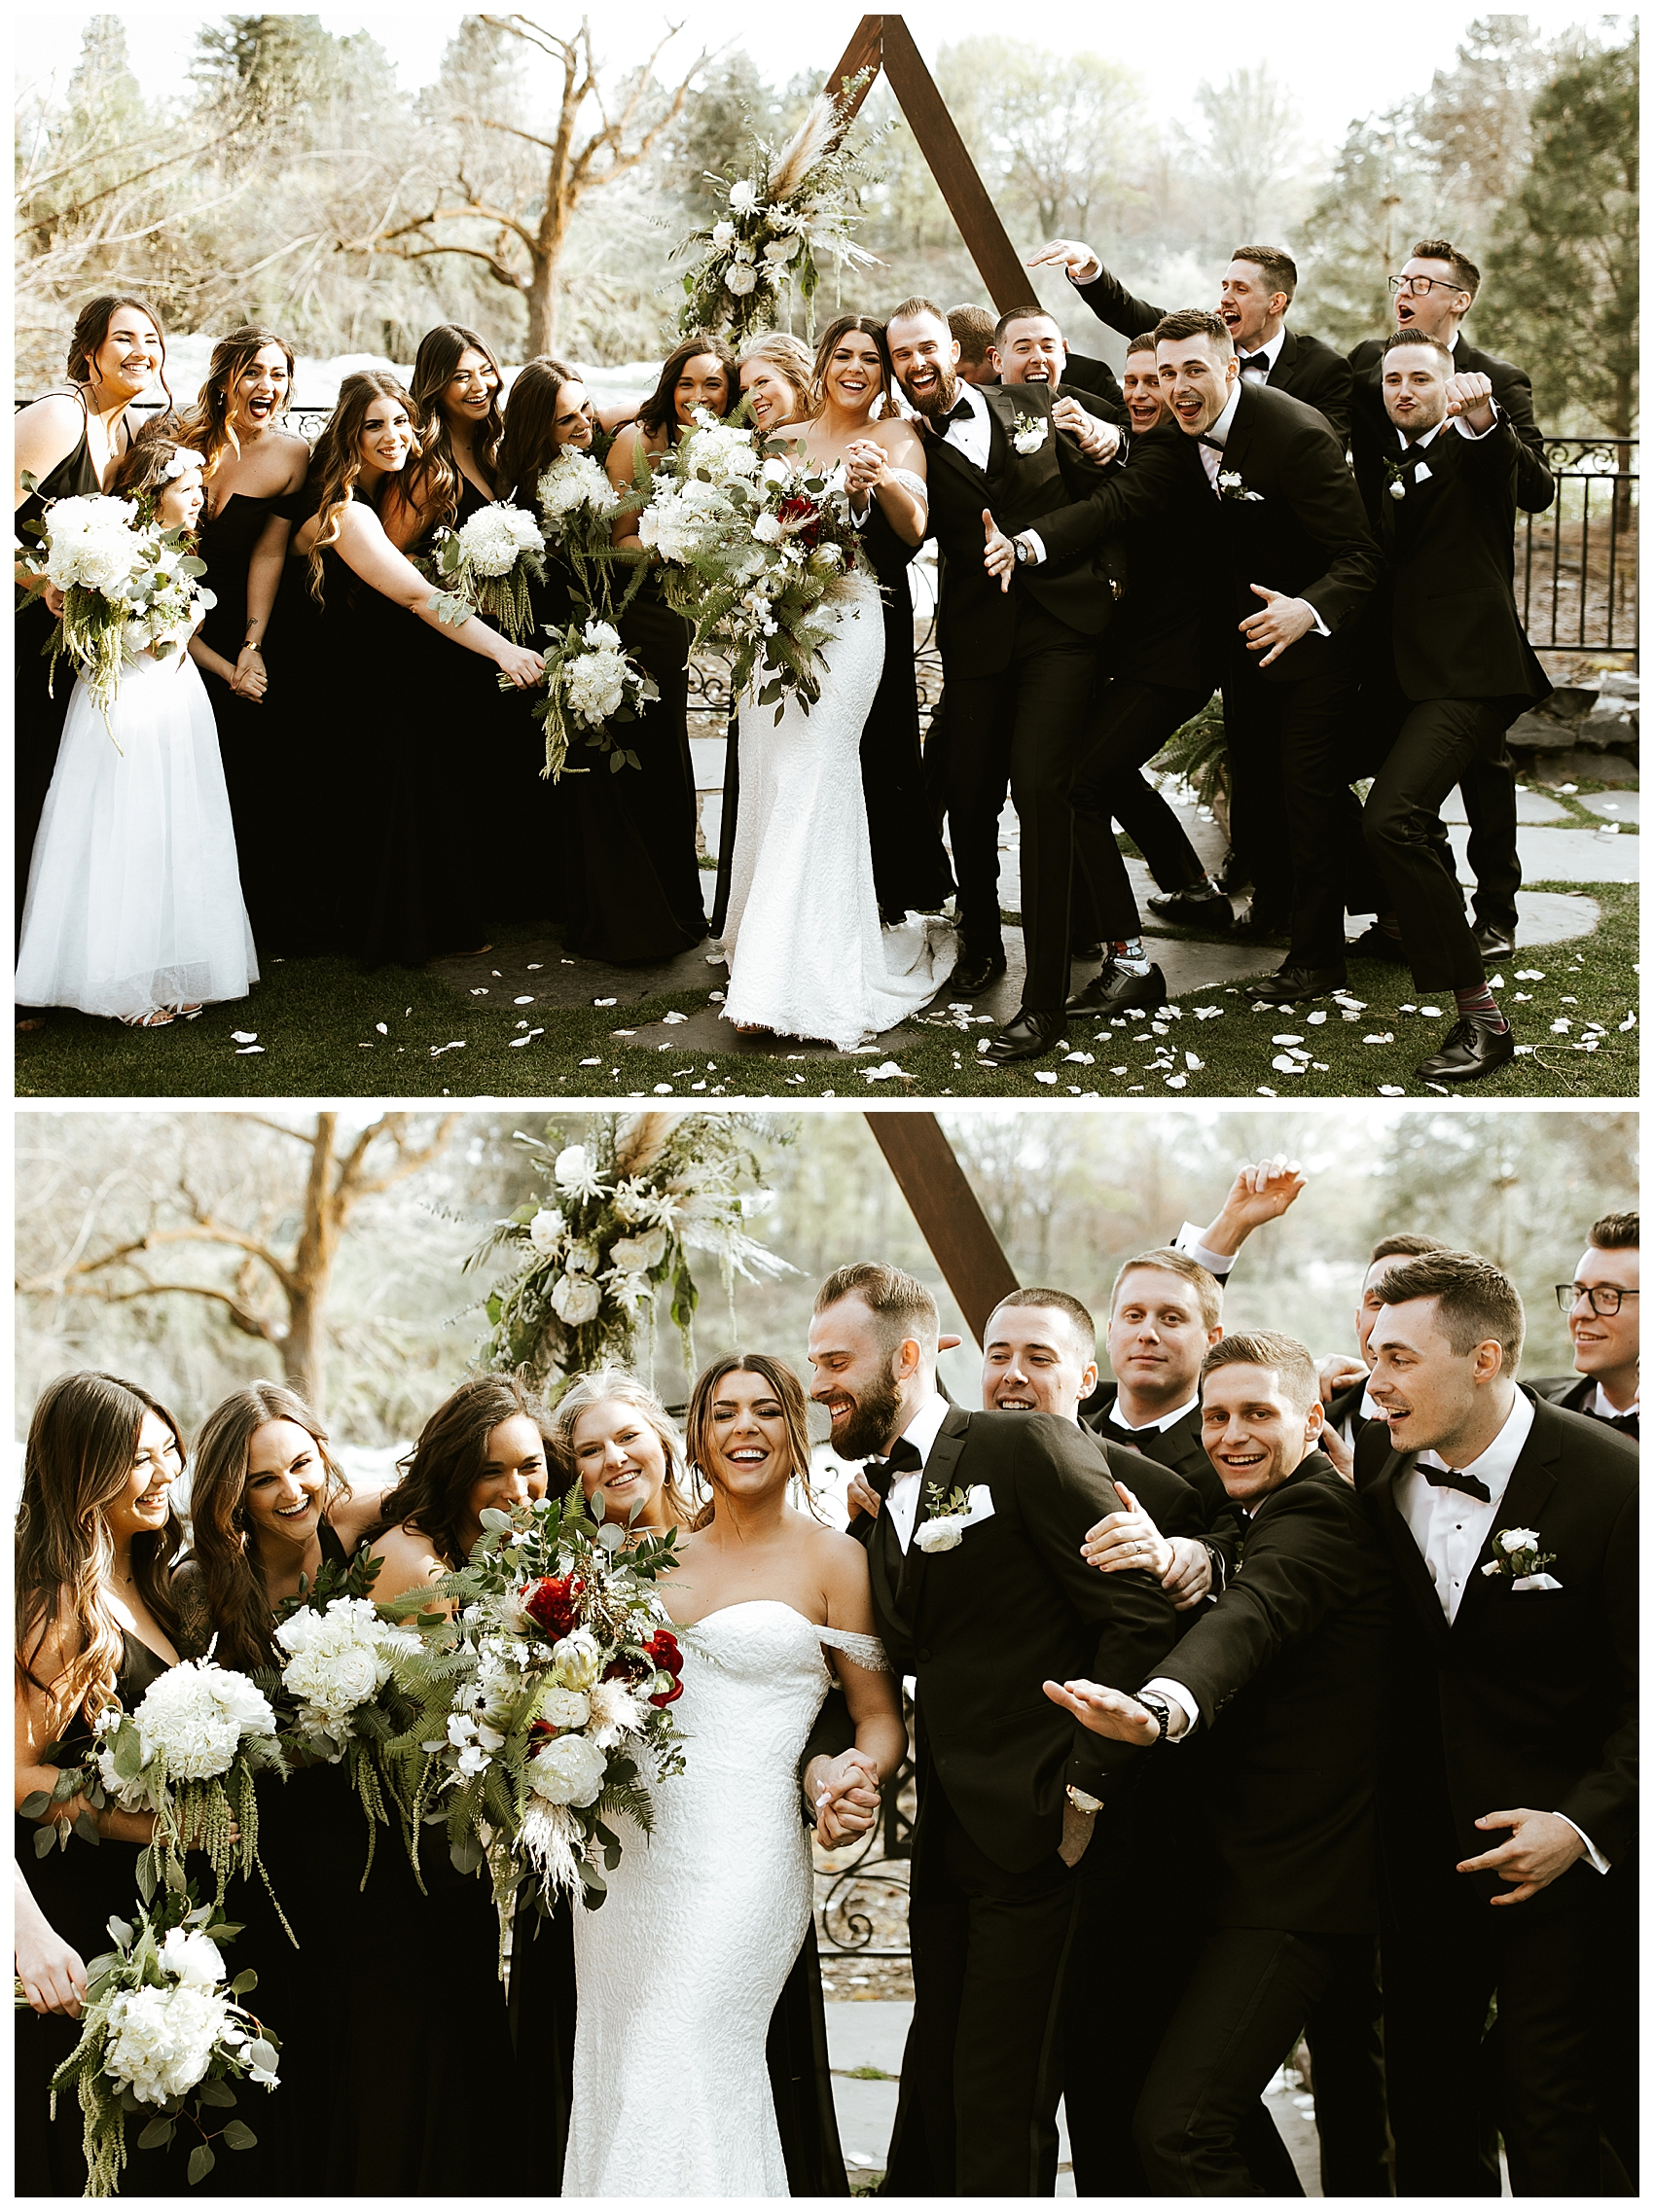 Chateau Rive Spokane Wedding Cassie Trottier Photography01067.jpg